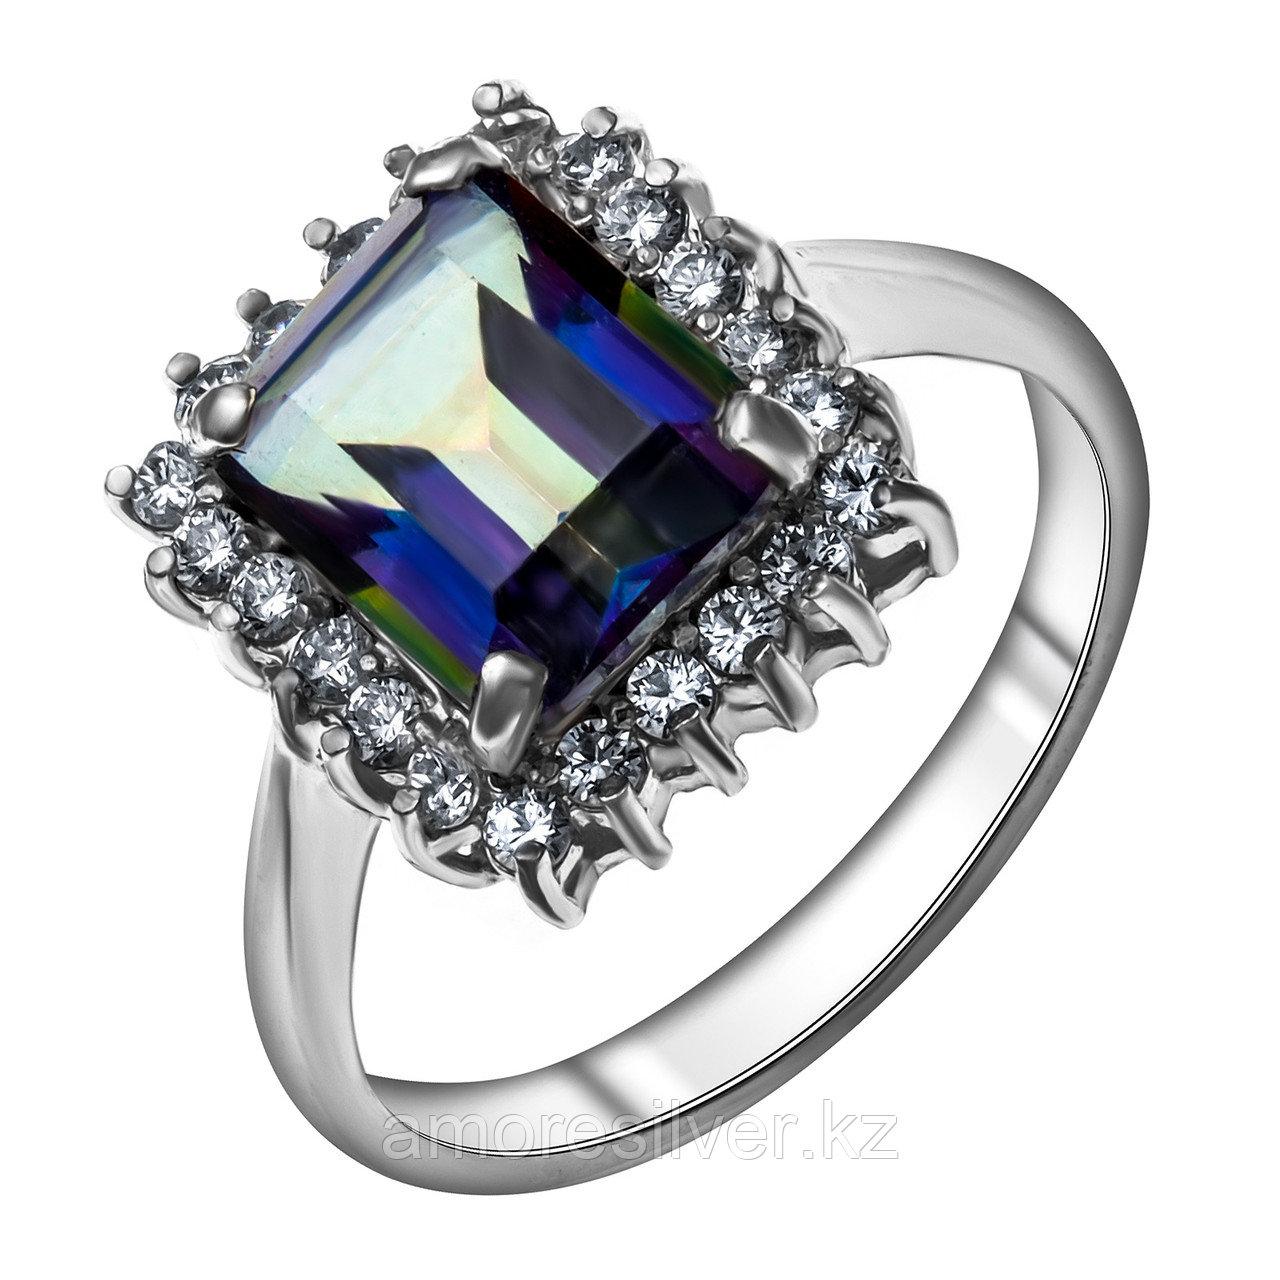 "Кольцо Мир серебра серебро с родием, мистик кварц фианит, ""каратник"" КТ-004мц размеры - 19"